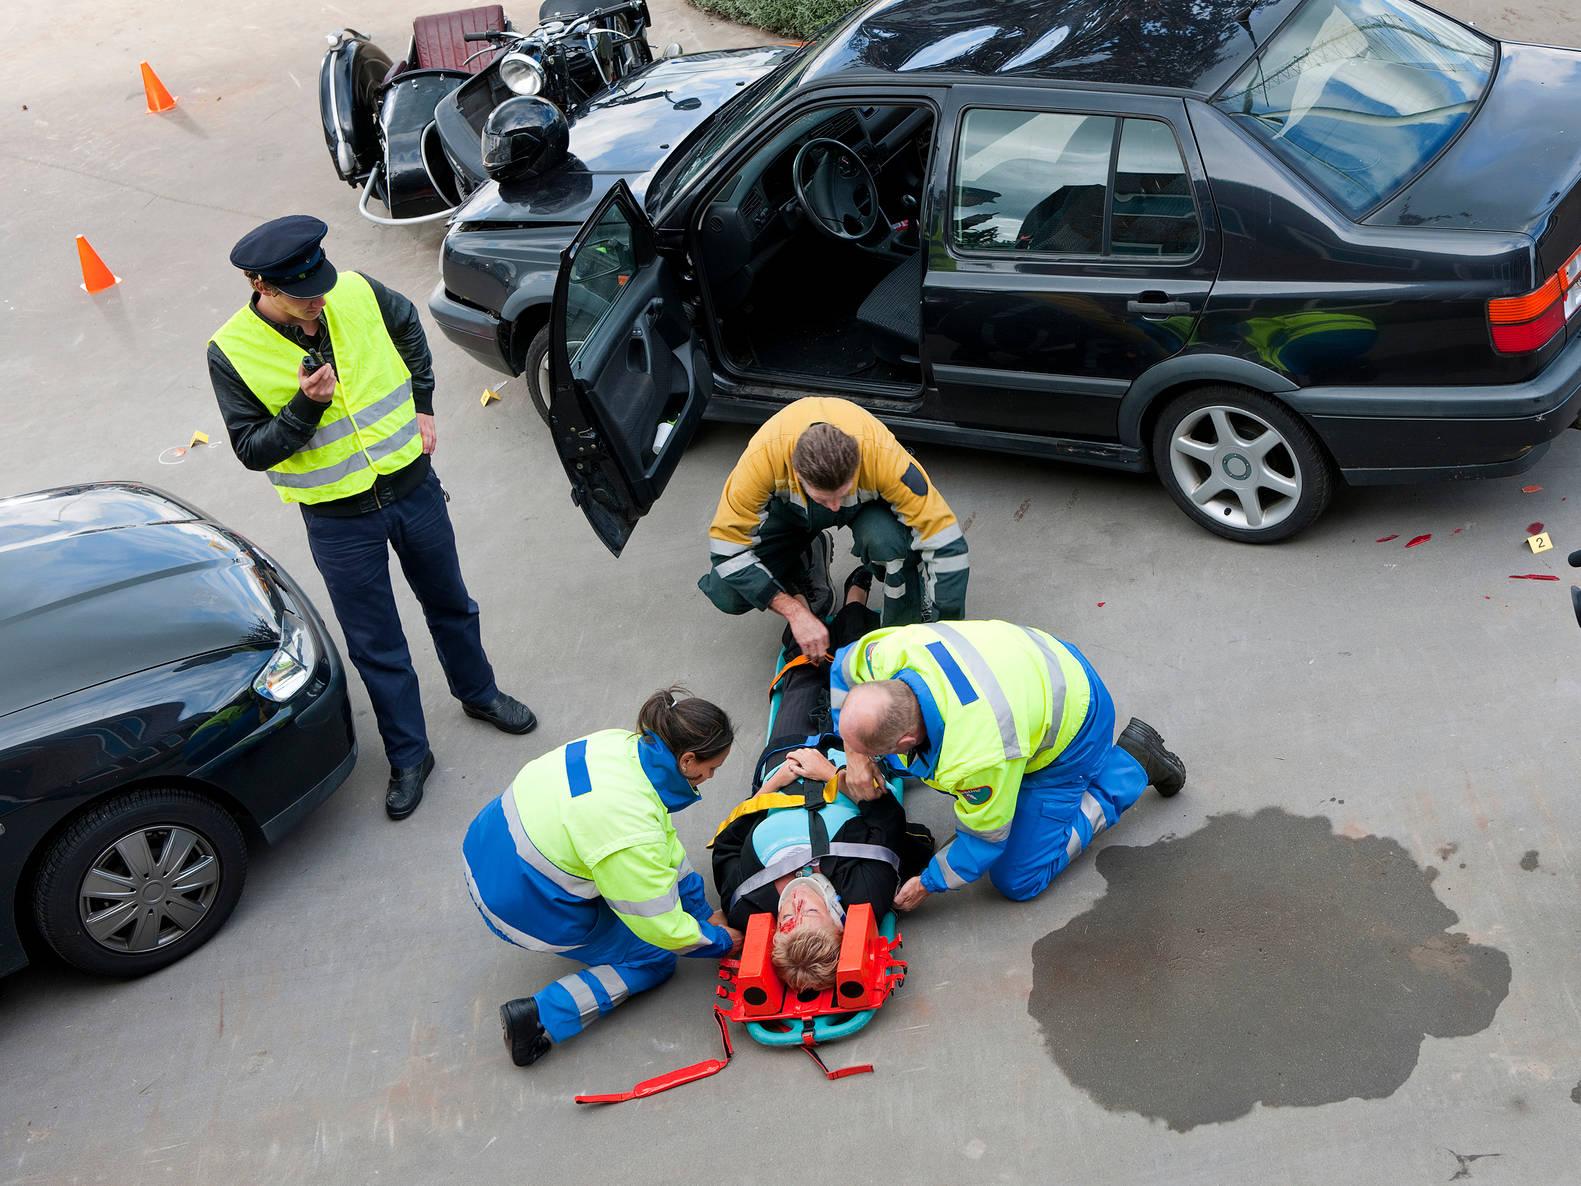 los angeles car accident scene